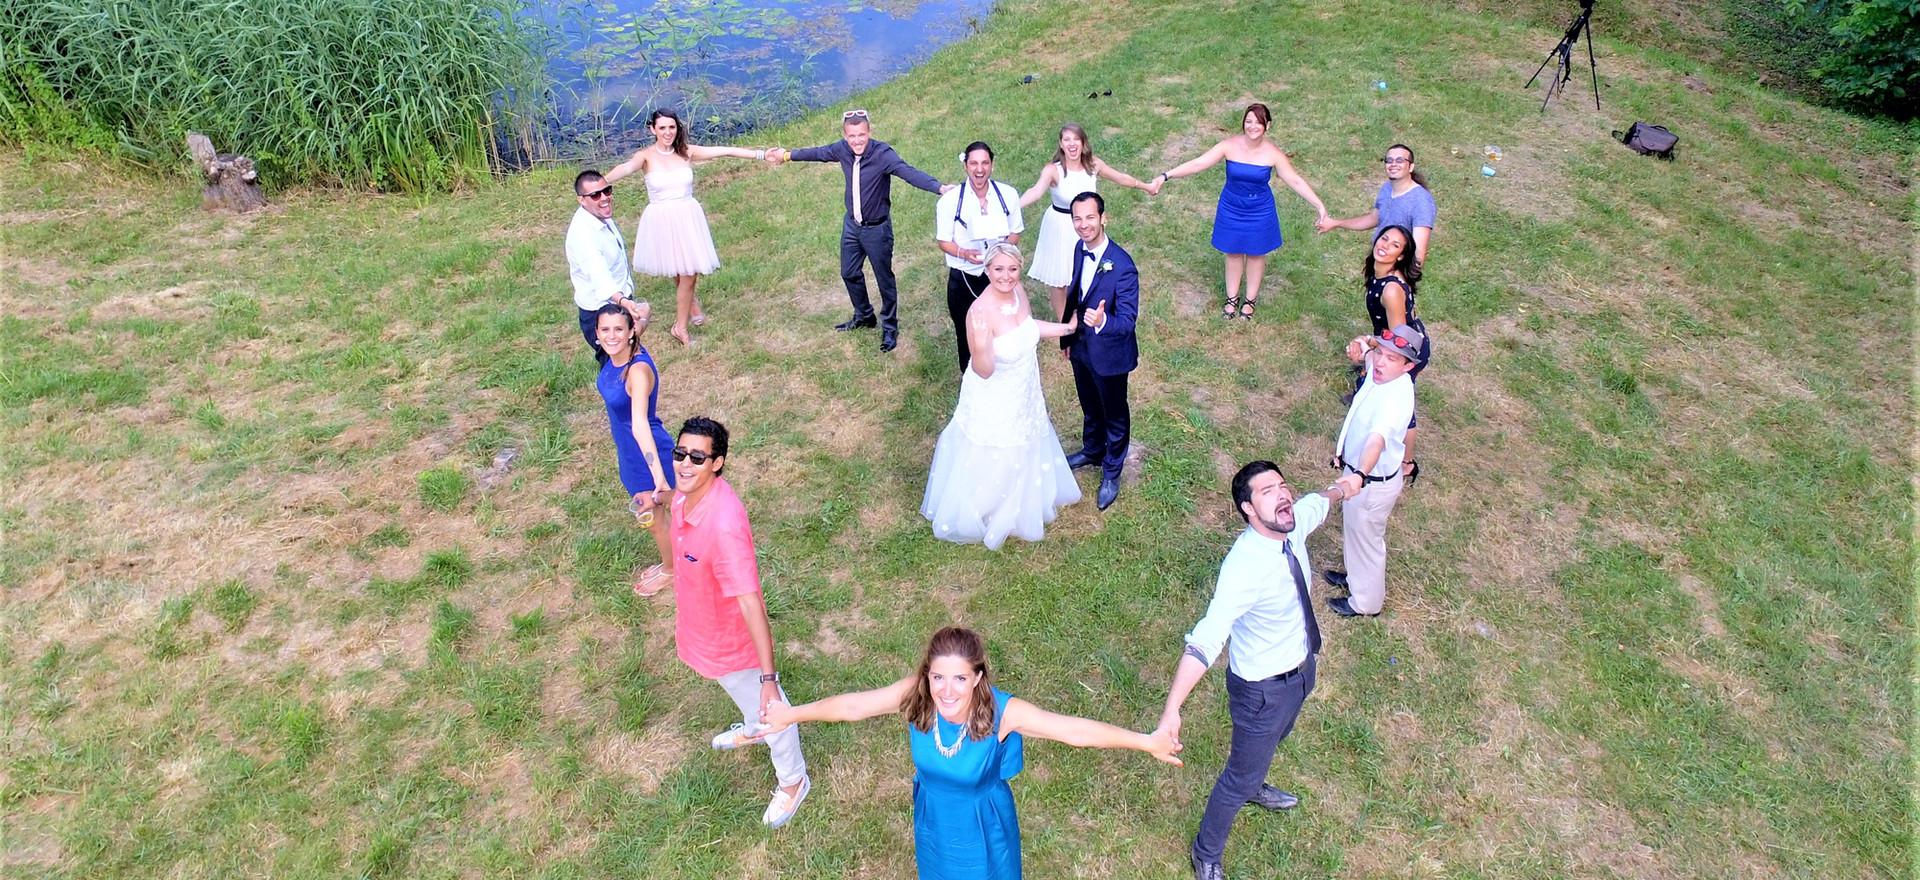 DRONE-mariage-rhone-alpes (2).JPG